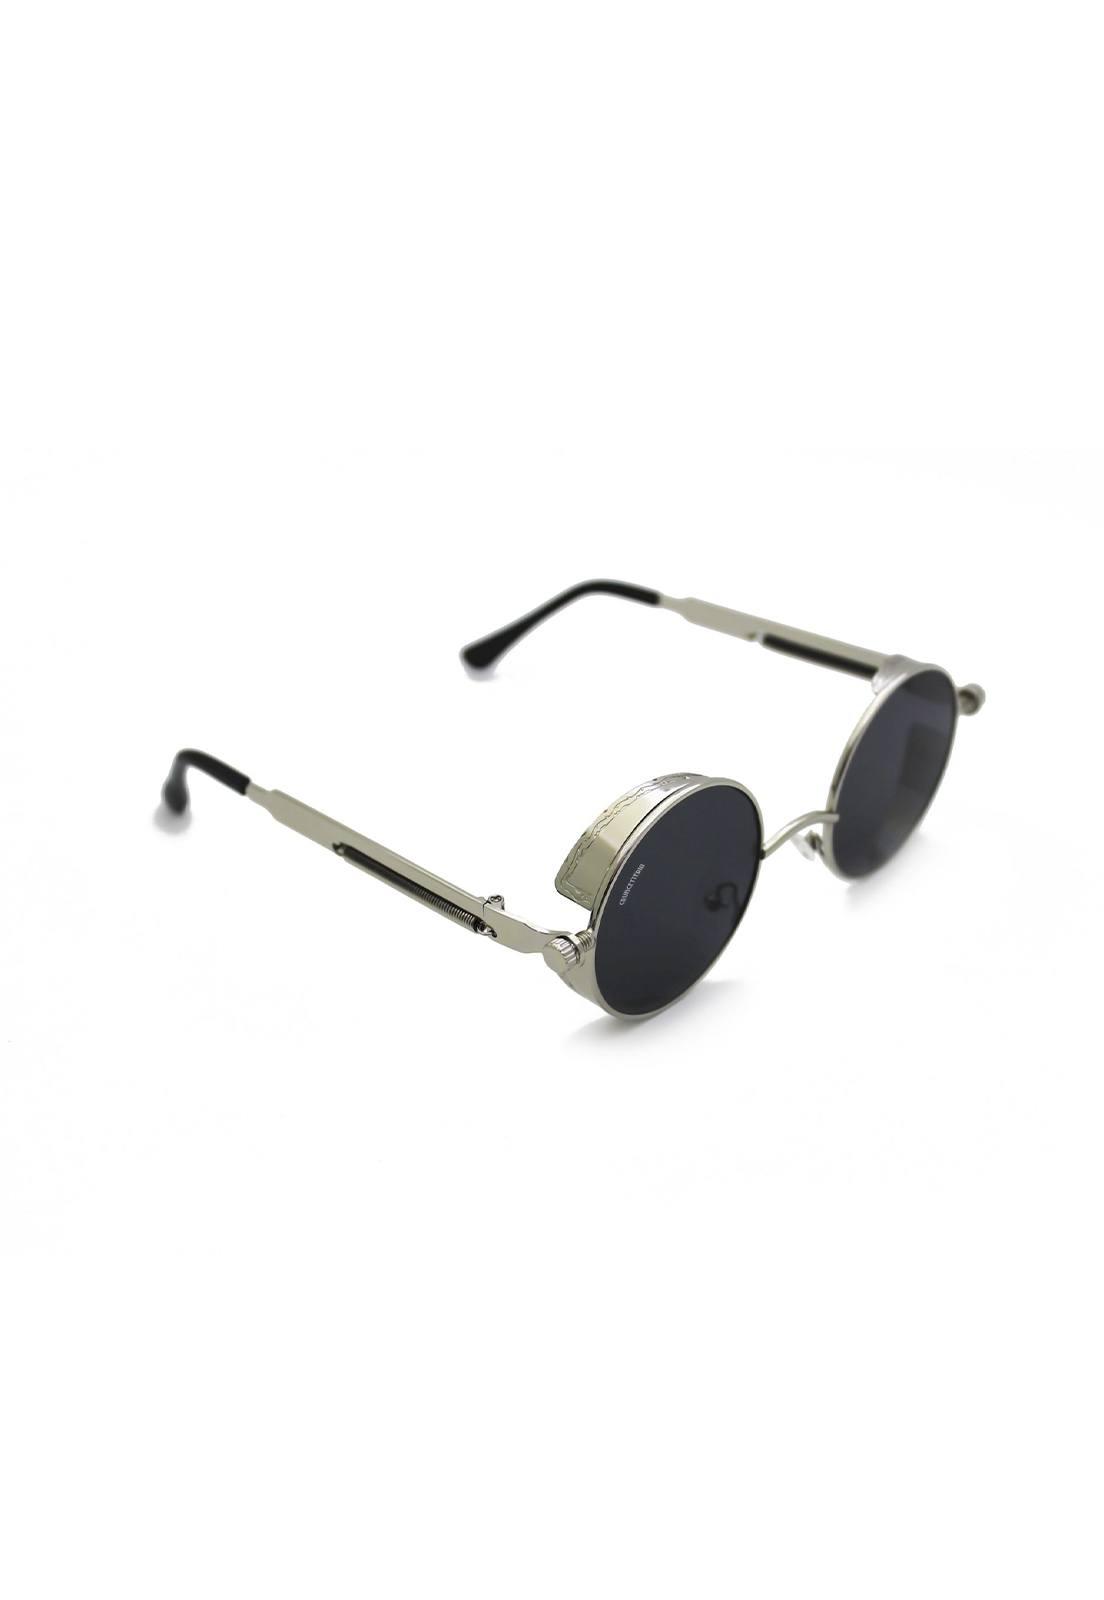 Óculos de Sol Grungetteria Sex Machine Prata